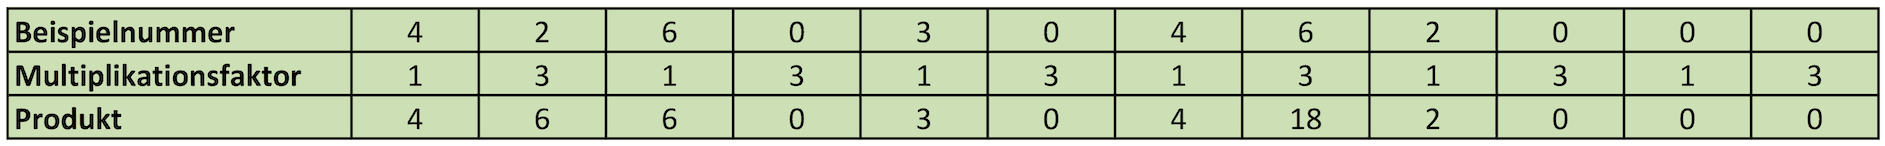 Ergebnis der Multiplikation